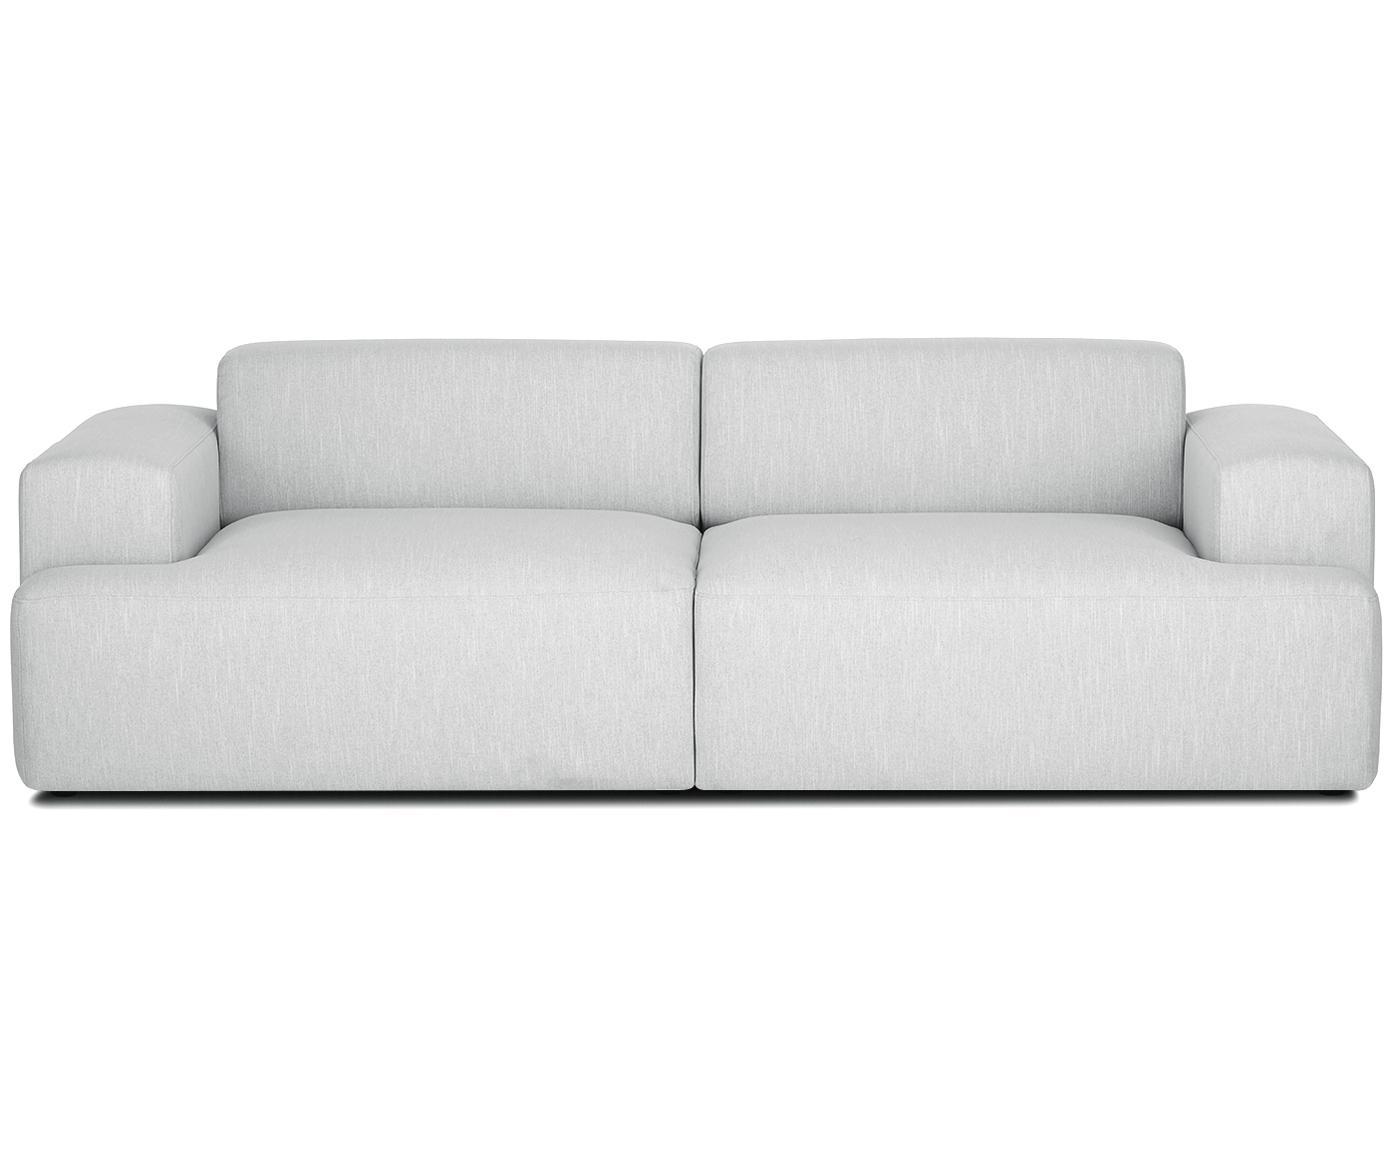 Sofa Melva (3-Sitzer), Bezug: Polyester 35.000 Scheuert, Gestell: Massives Kiefernholz, Spa, Webstoff Hellgrau, B 240 x T 101 cm